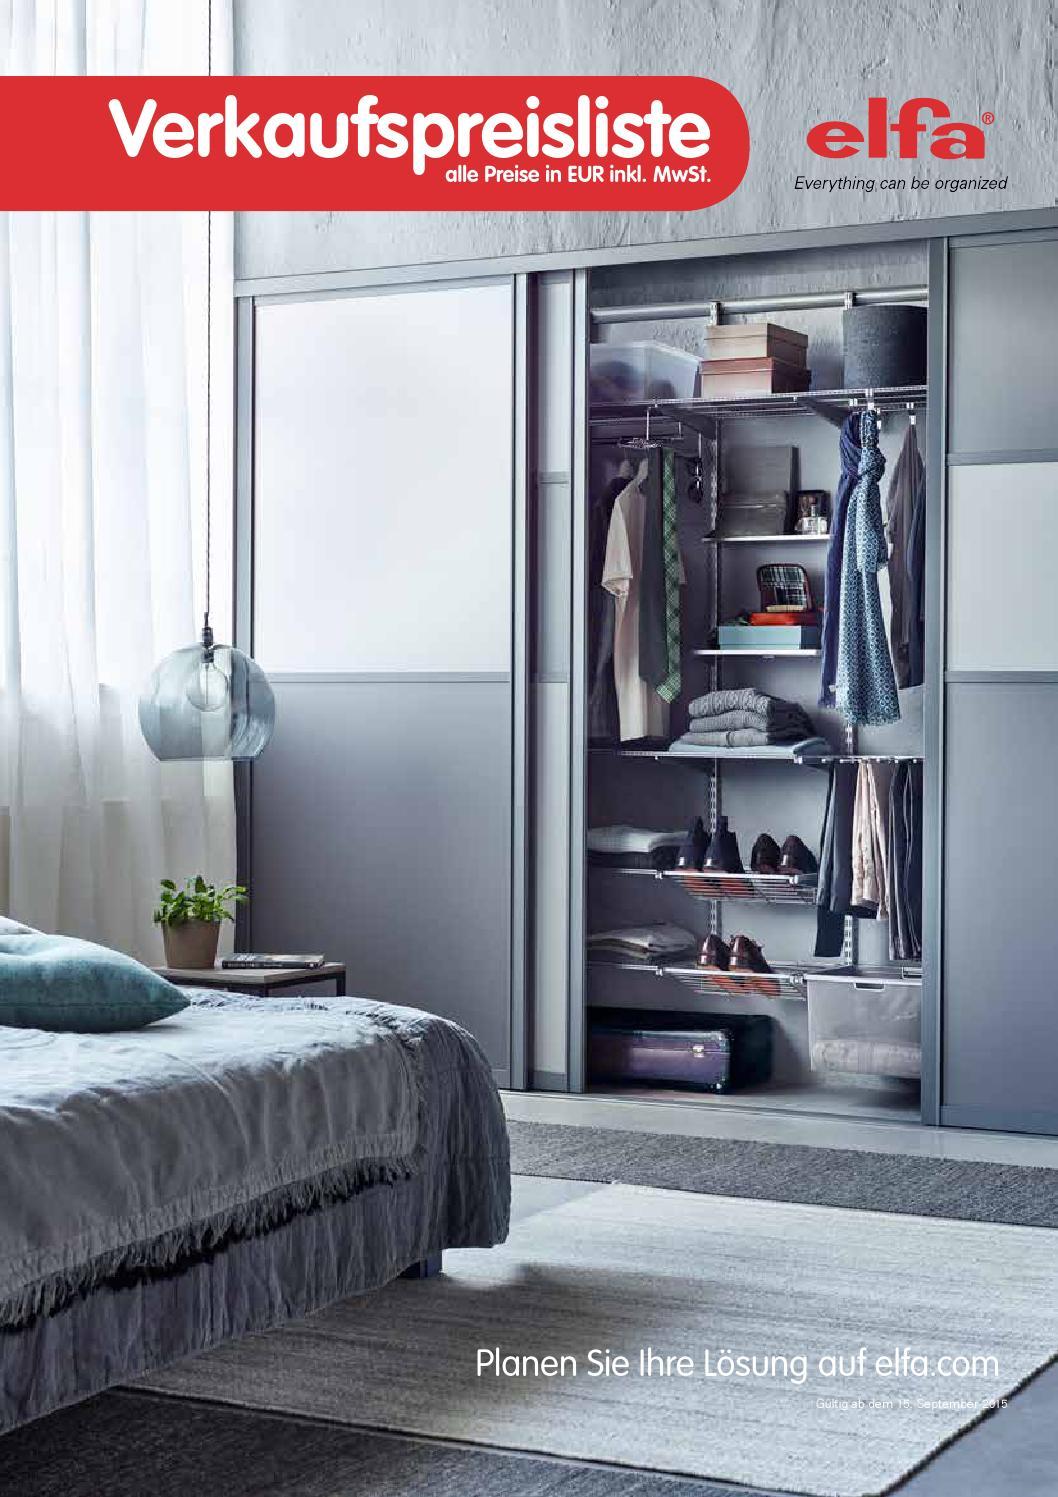 elfa de verkaufspreisliste 20150901 by elfa international. Black Bedroom Furniture Sets. Home Design Ideas